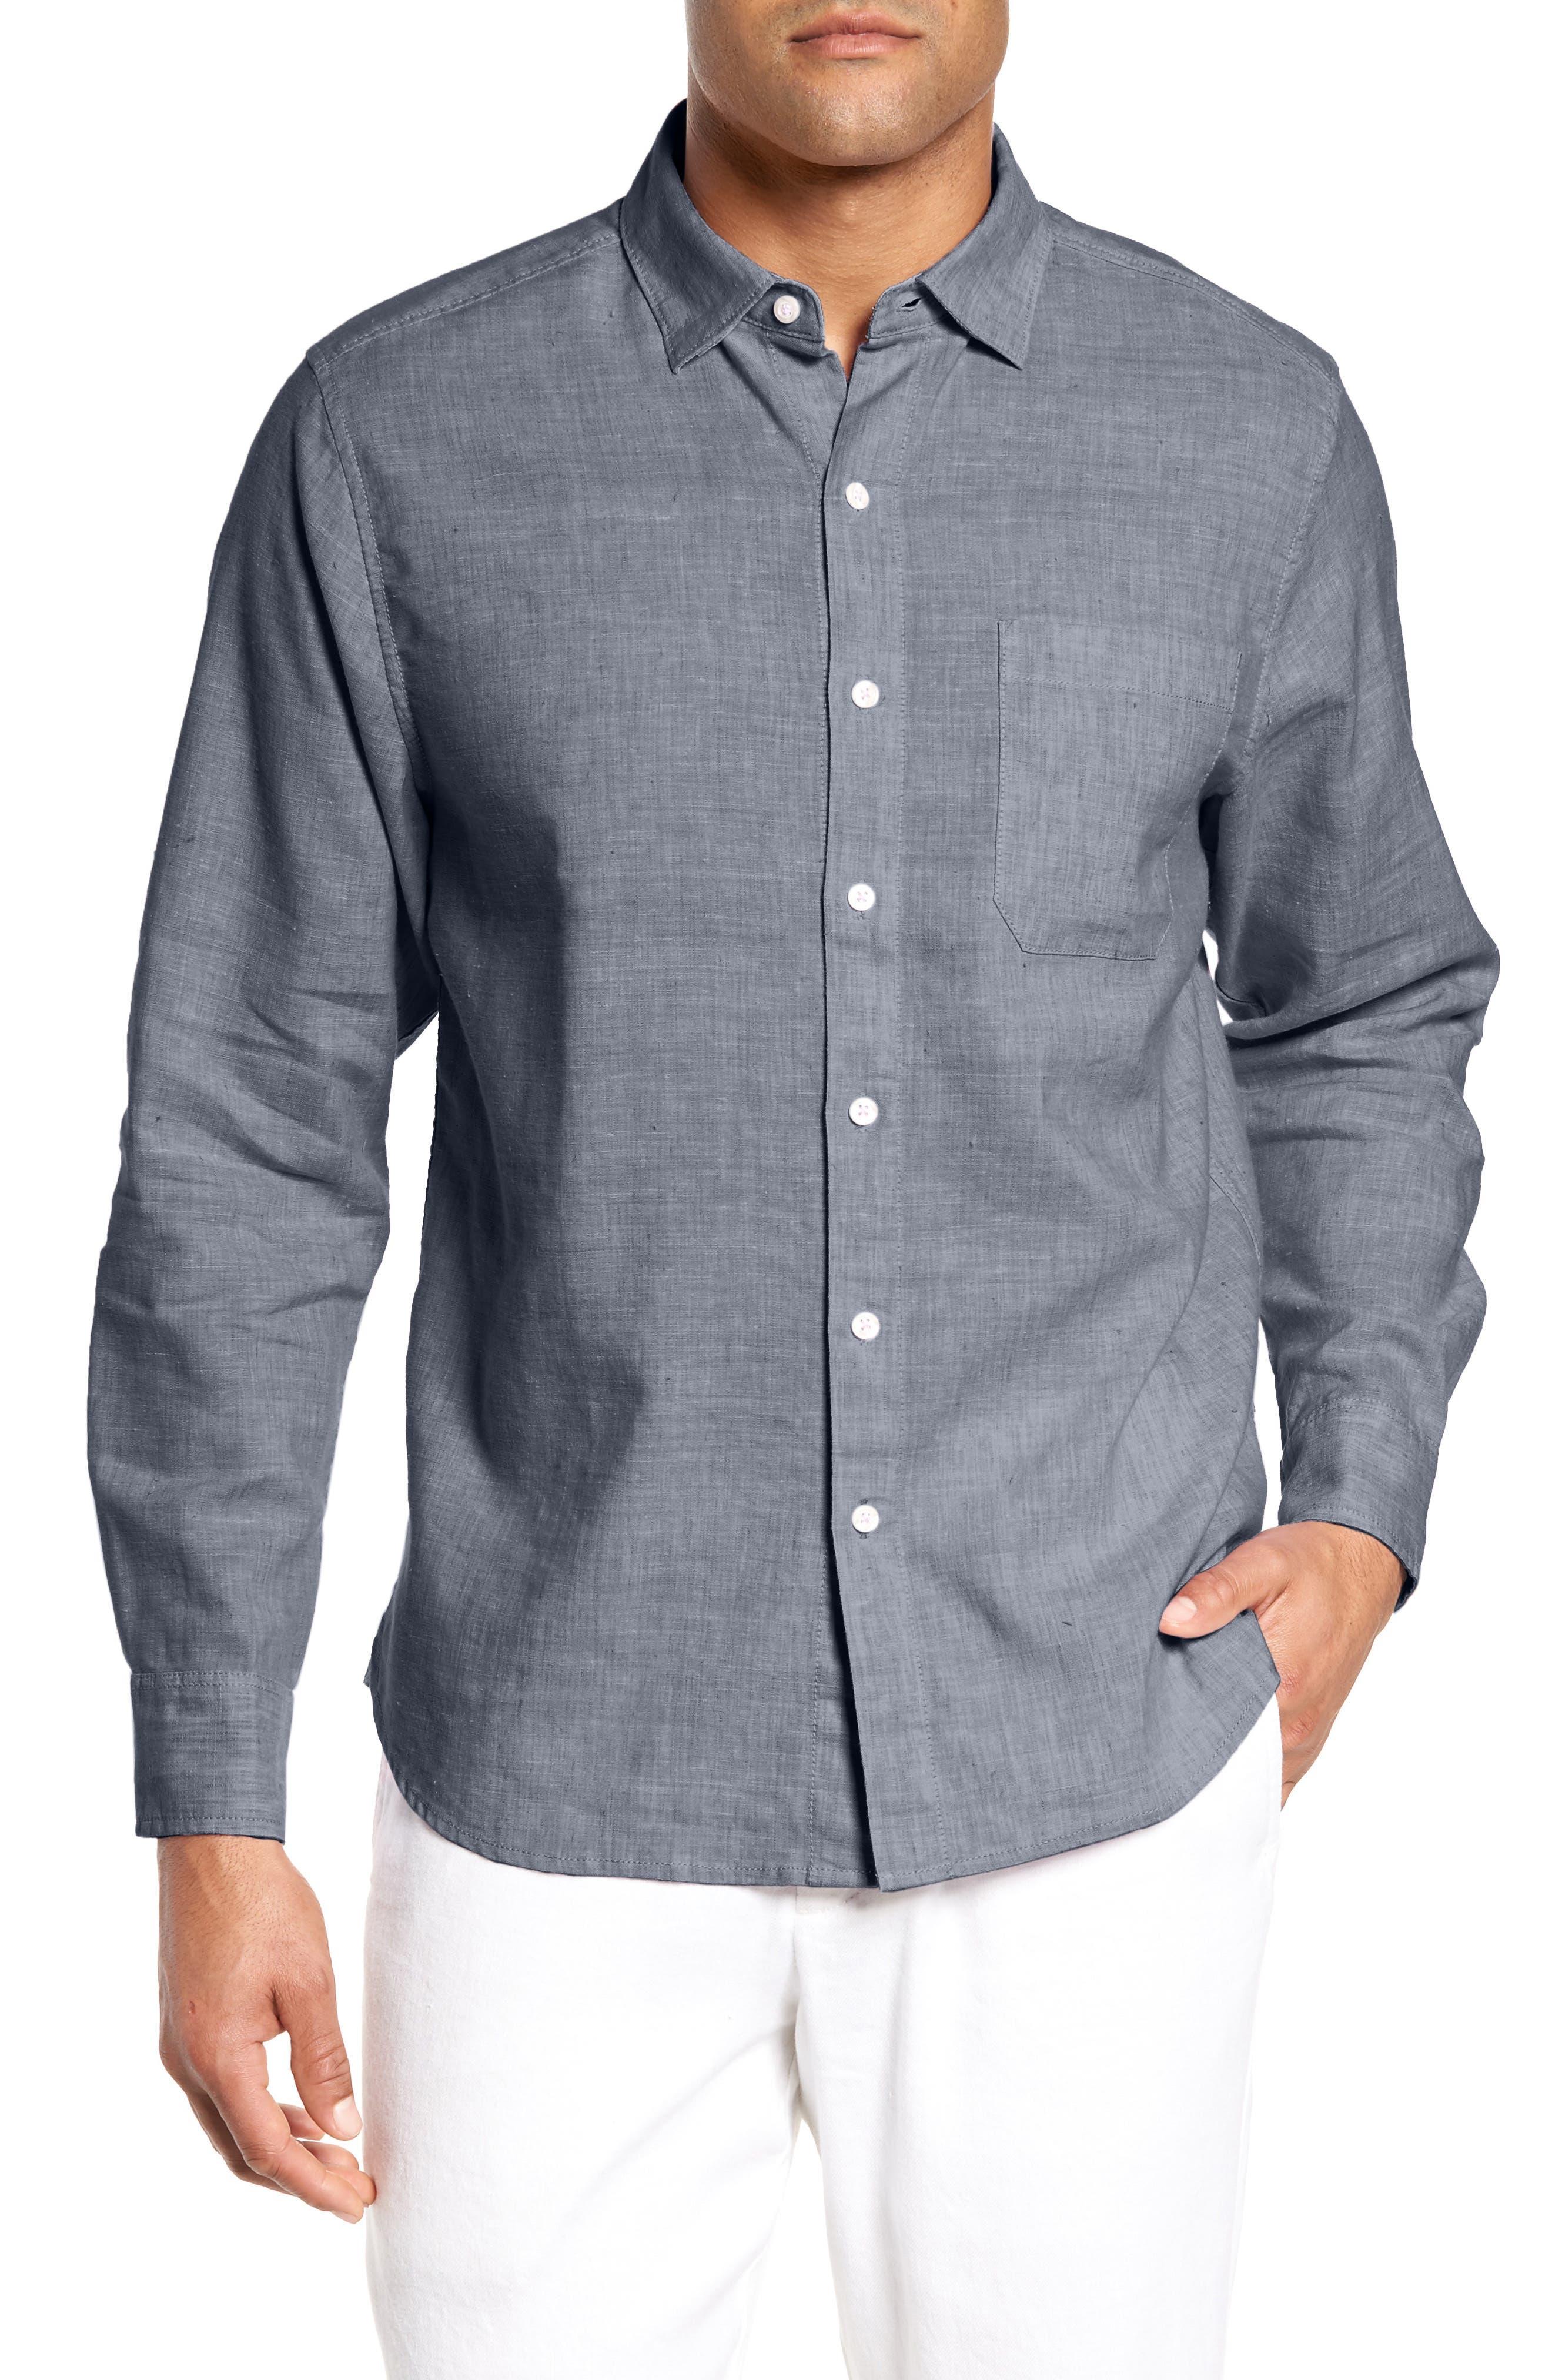 Lanai Tides Regular Fit Linen Blend Sport Shirt,                             Main thumbnail 1, color,                             Throne Blue